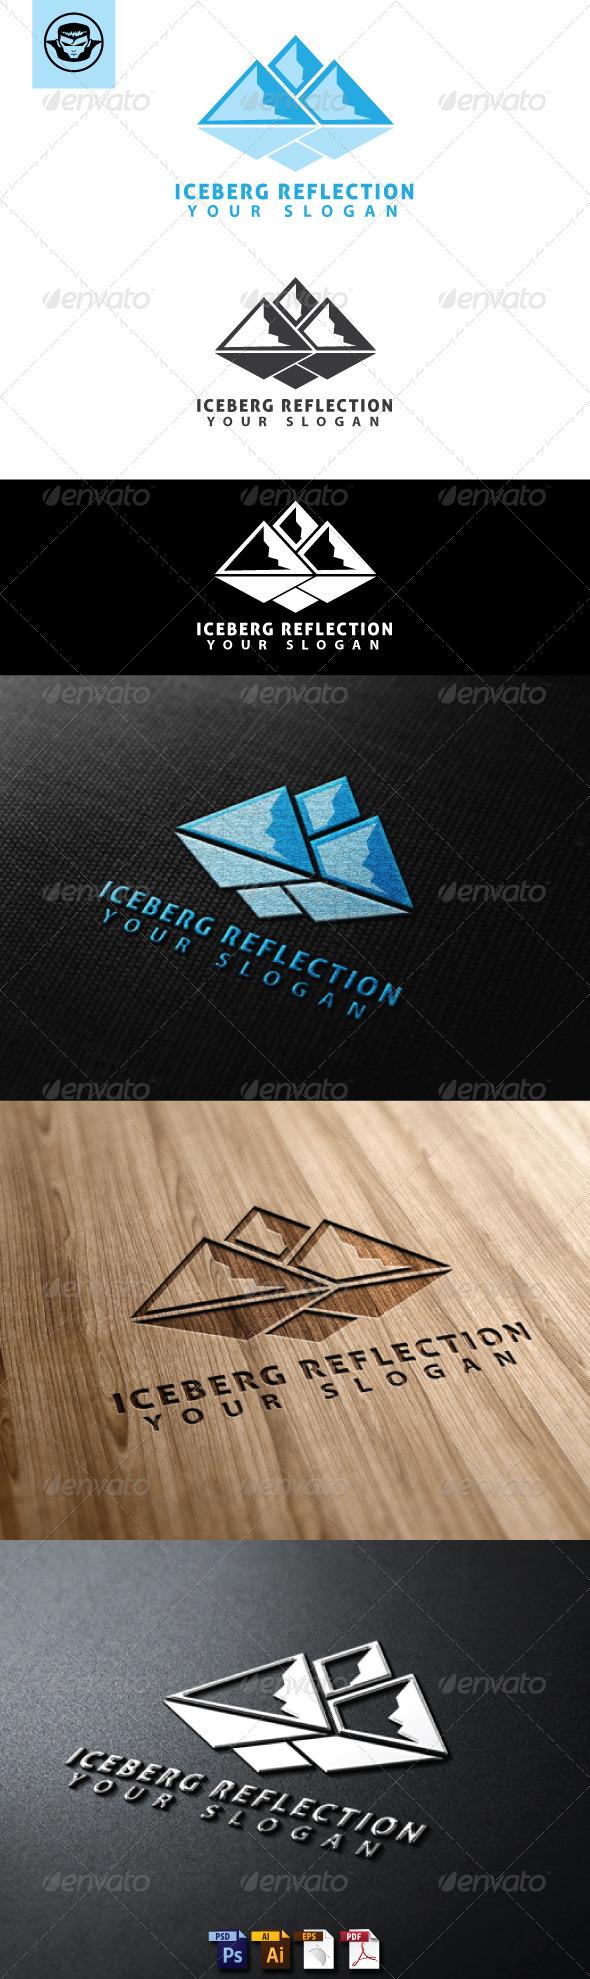 Iceberg Reflection Logo Template